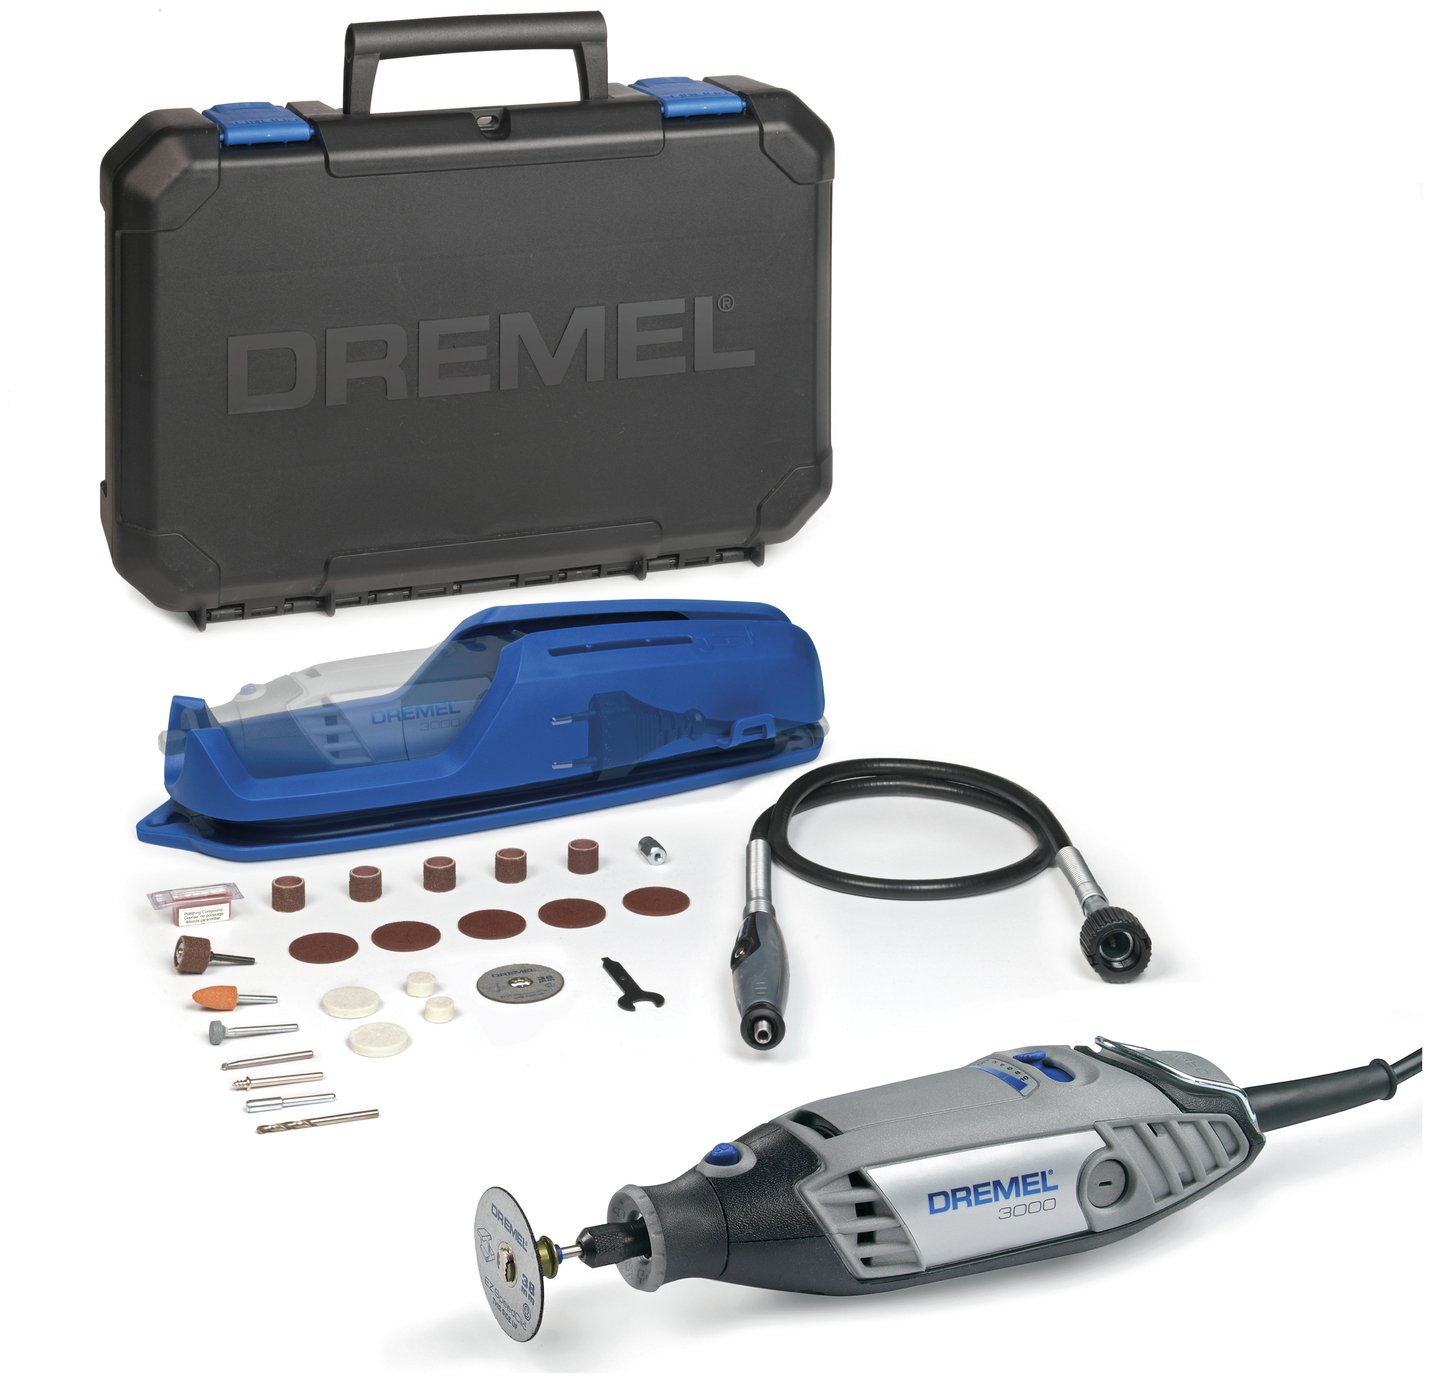 Dremel 3000 Multi-tool